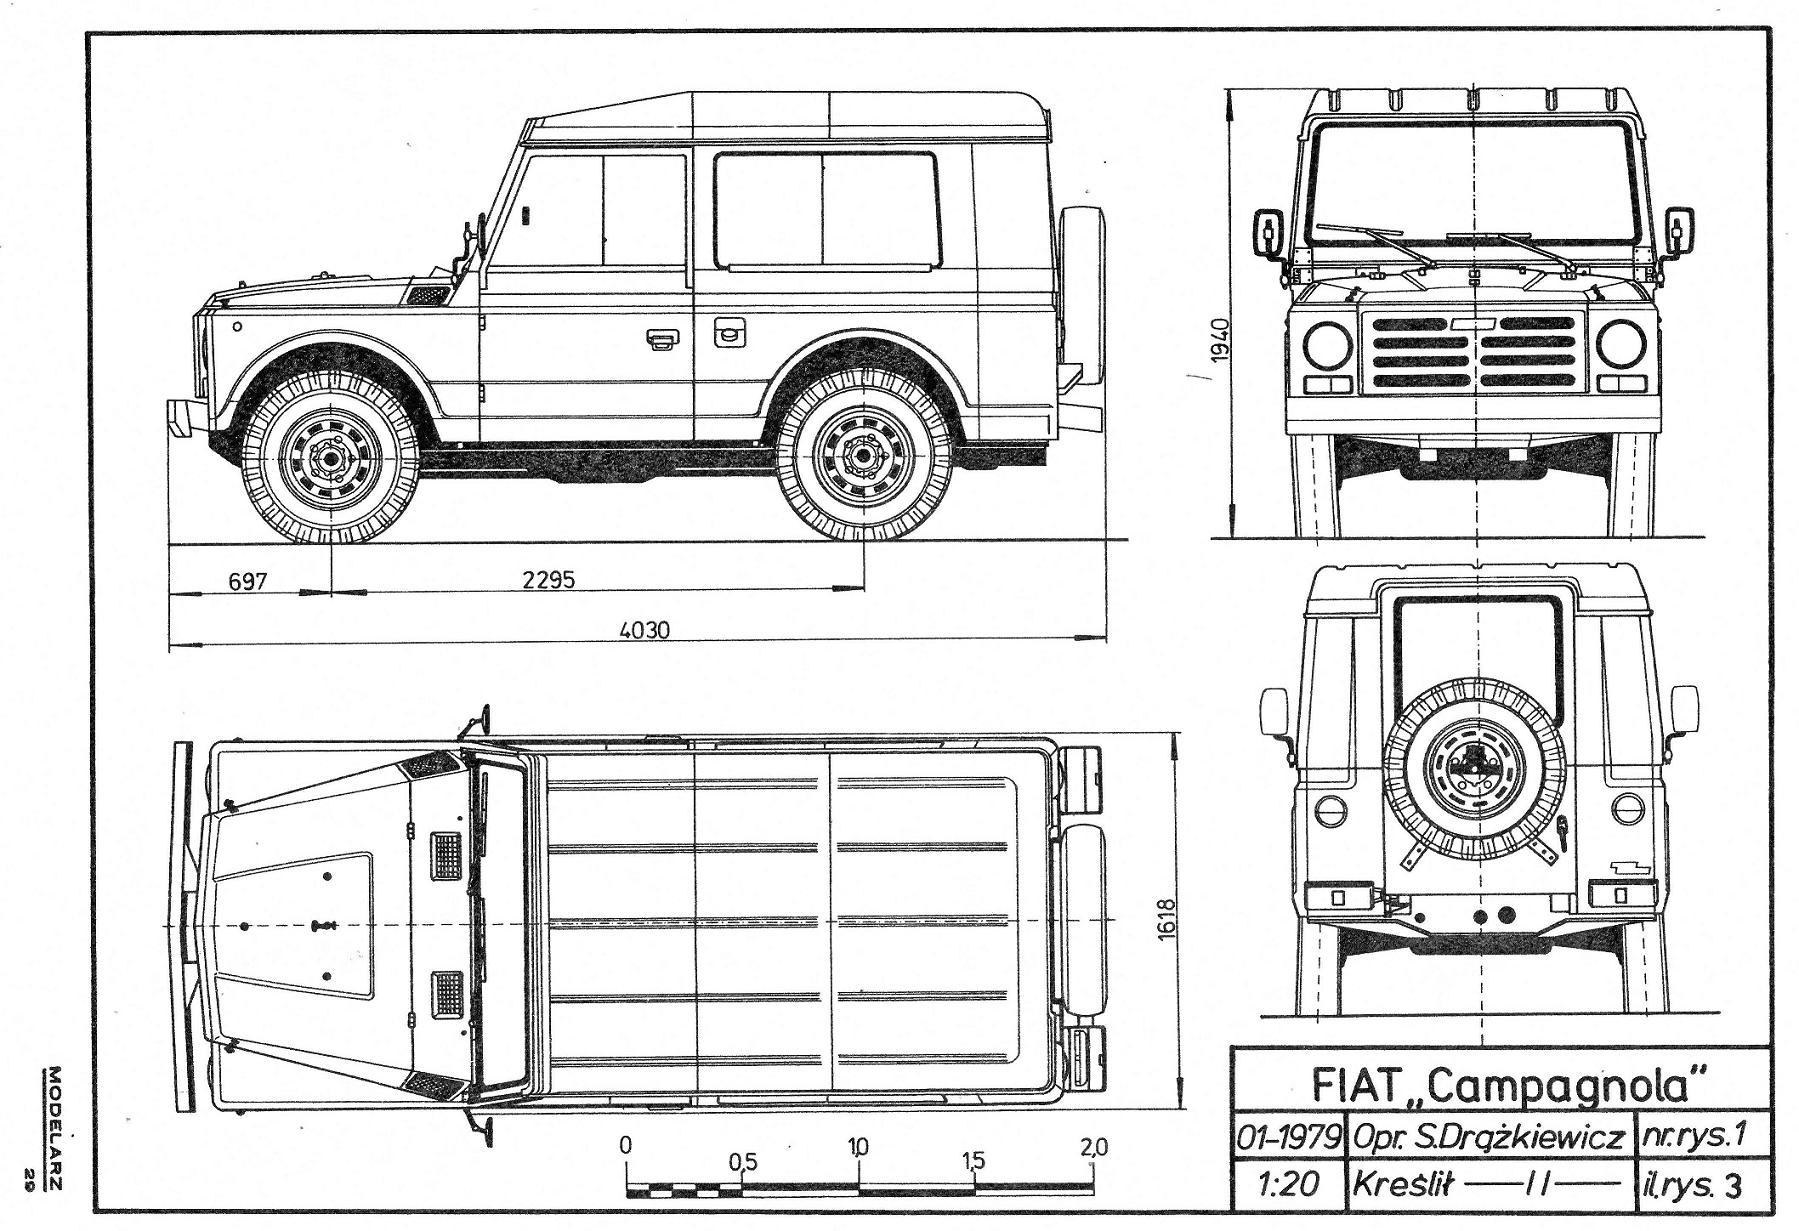 Fiat Nuova Campagnola Blueprint